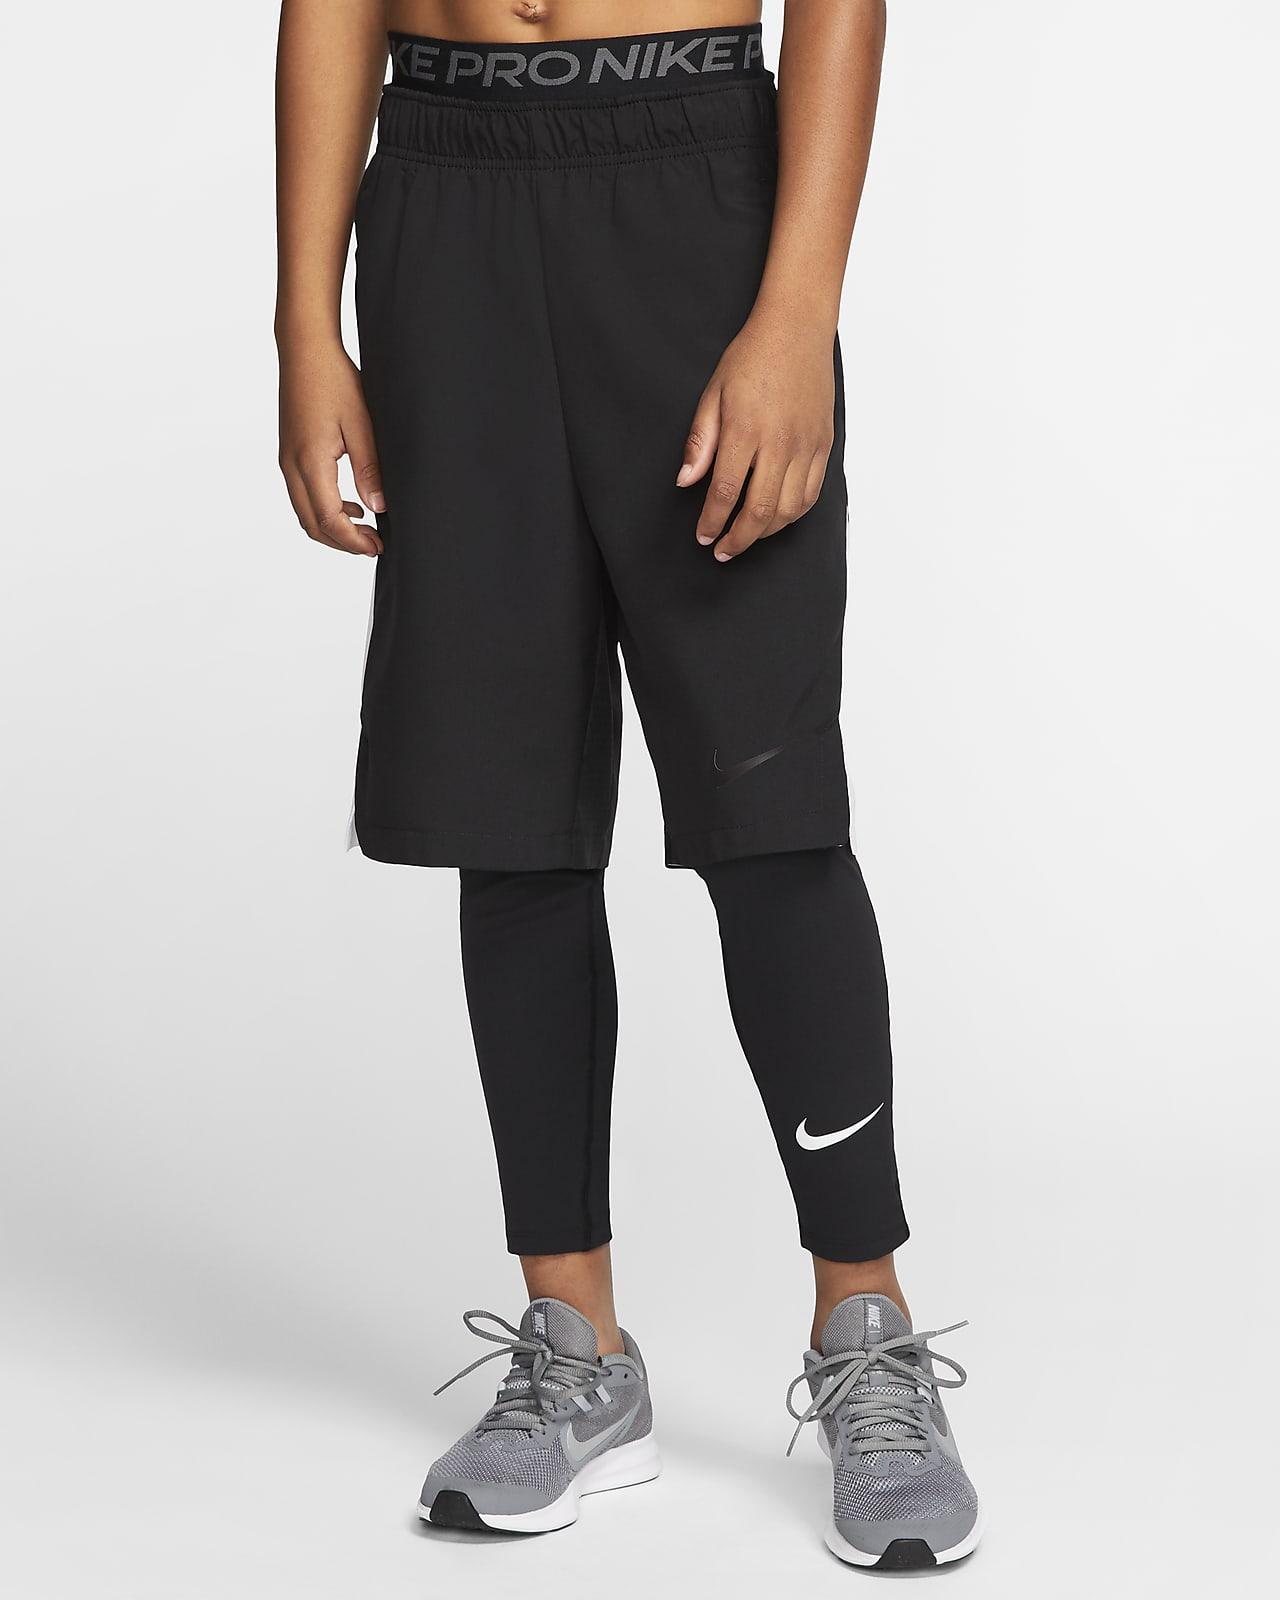 Nike Pro Malles - Nen